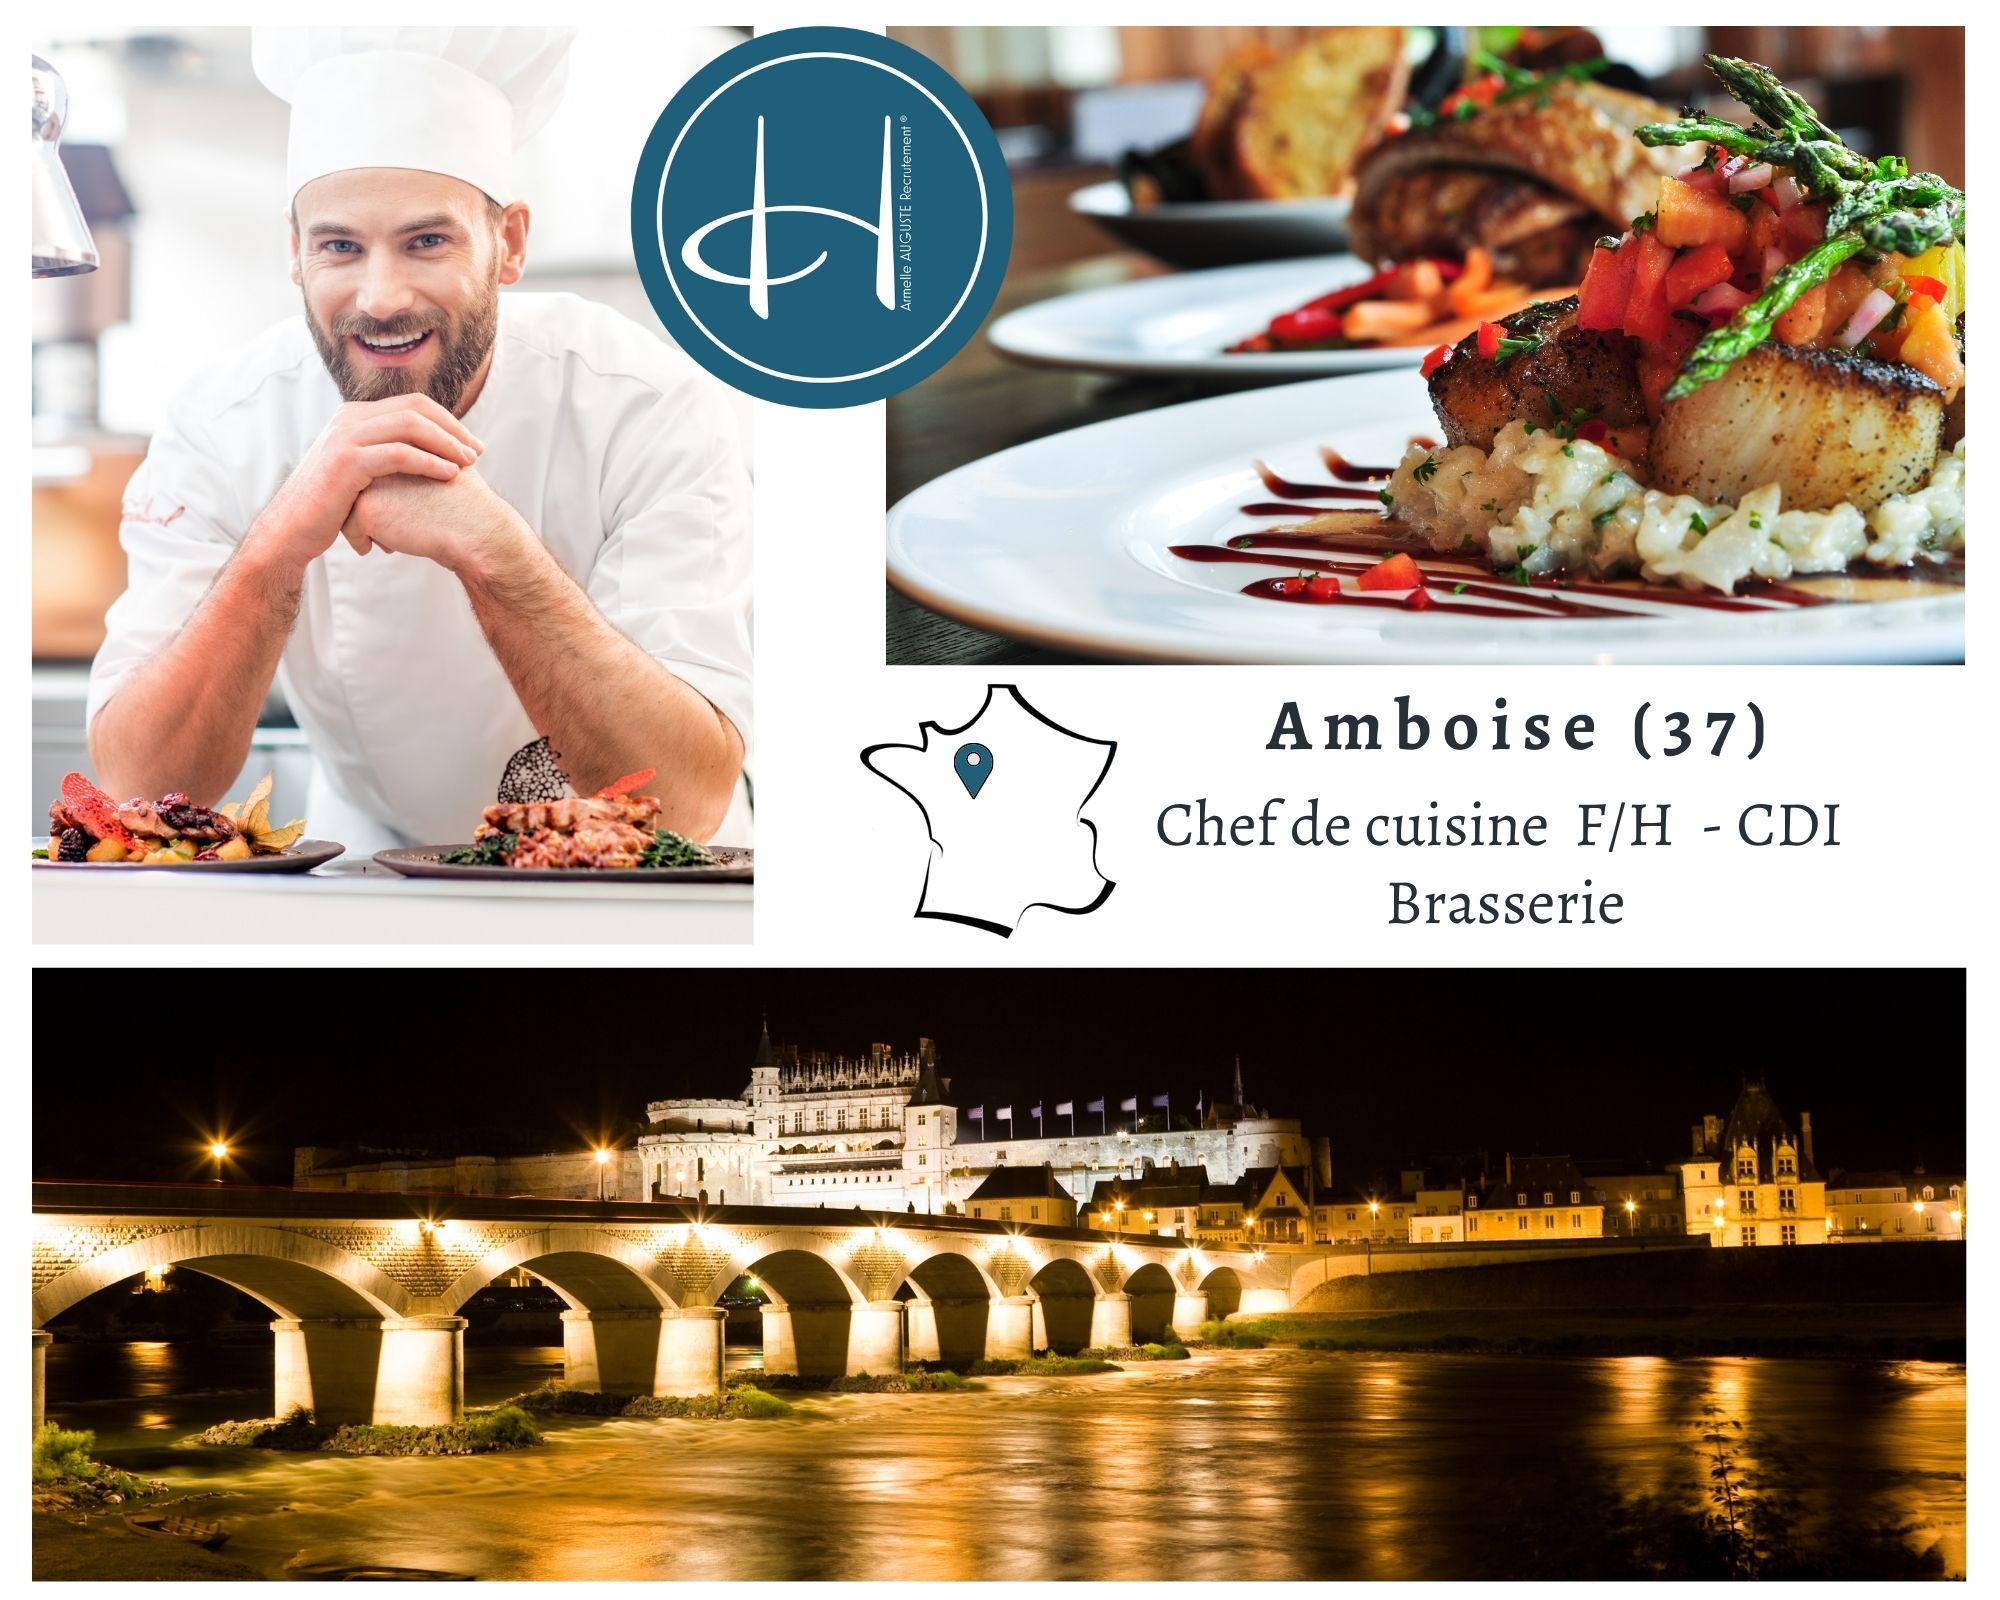 Recrutement: Chef de cuisine brasserie F/H chez Armelle AUGUSTE Recrutement® à Amboise